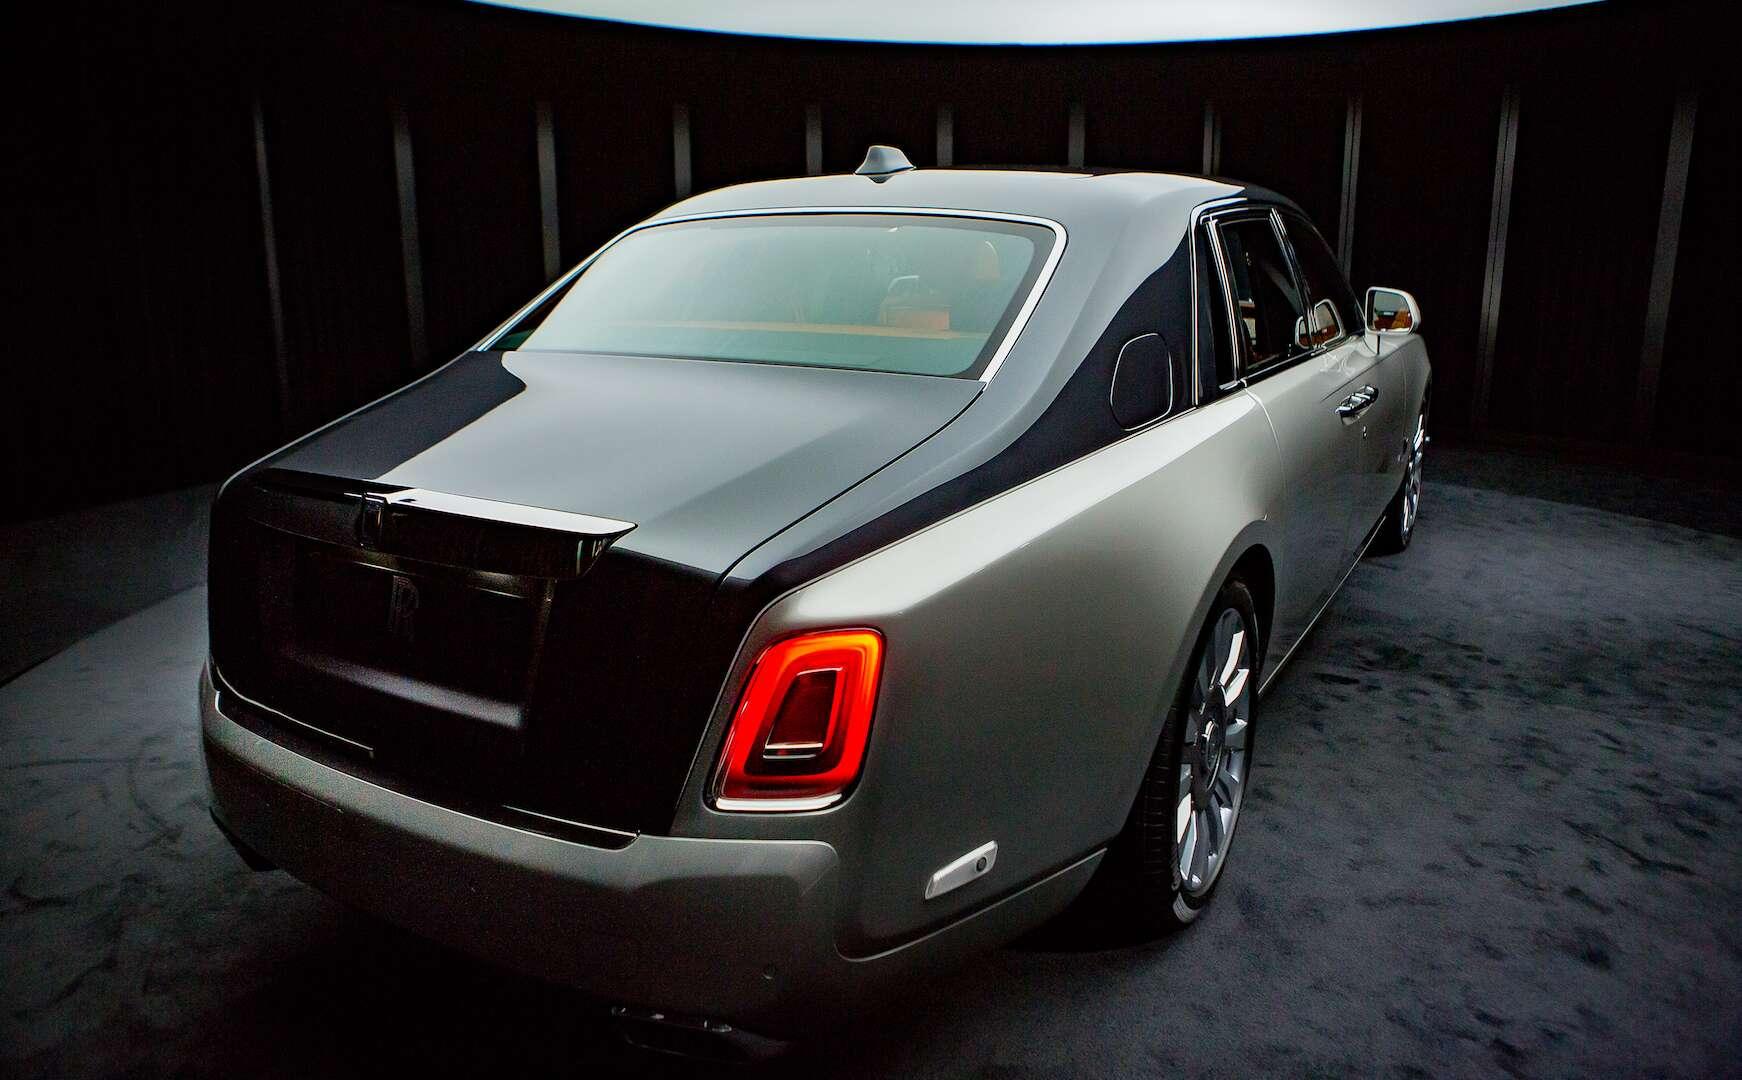 2018 rolls-royce phantom revealed: a $450,000 car with a built-in